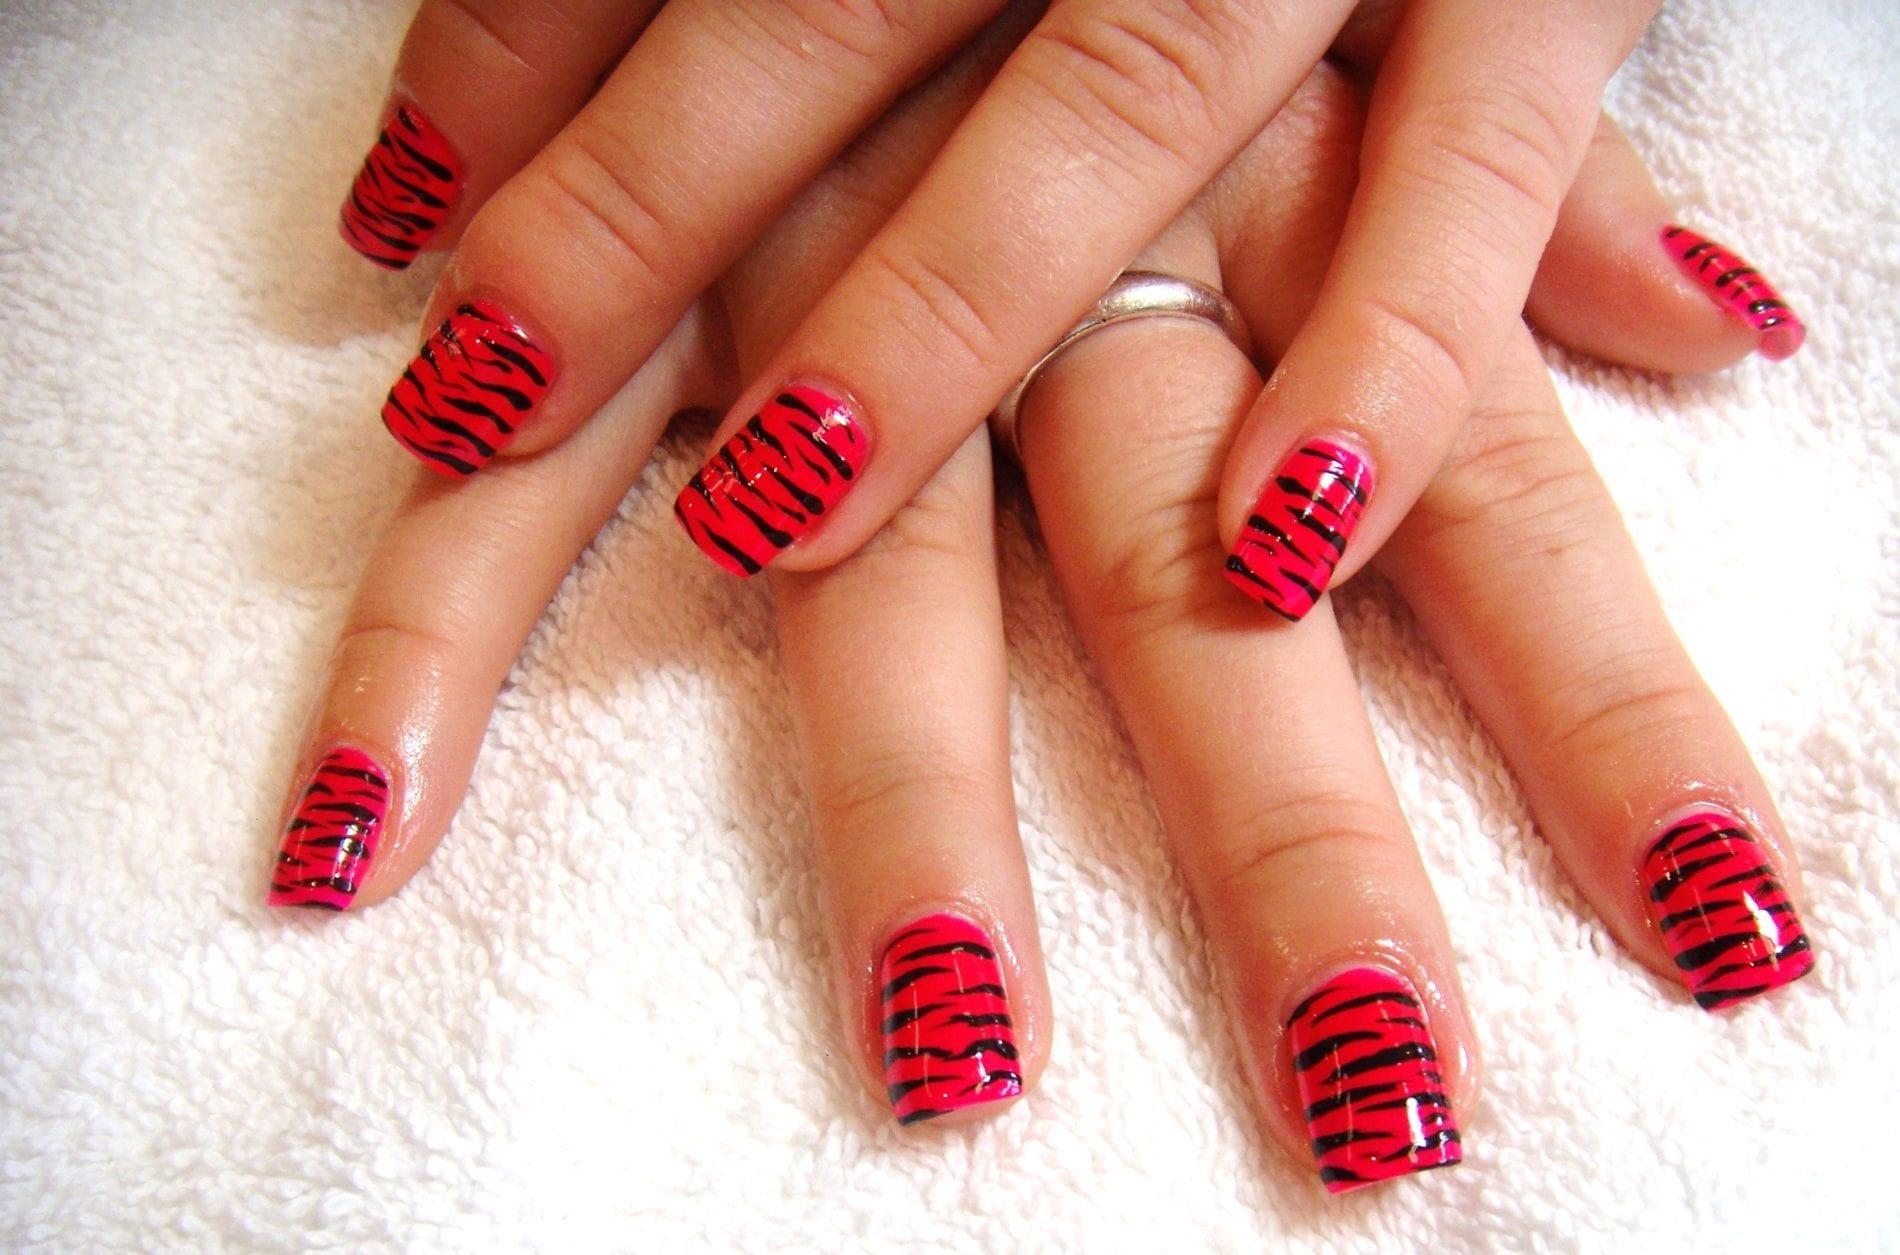 Дизайн ногтей фото: 270 фото, самый красивый дизайн ногтей 94